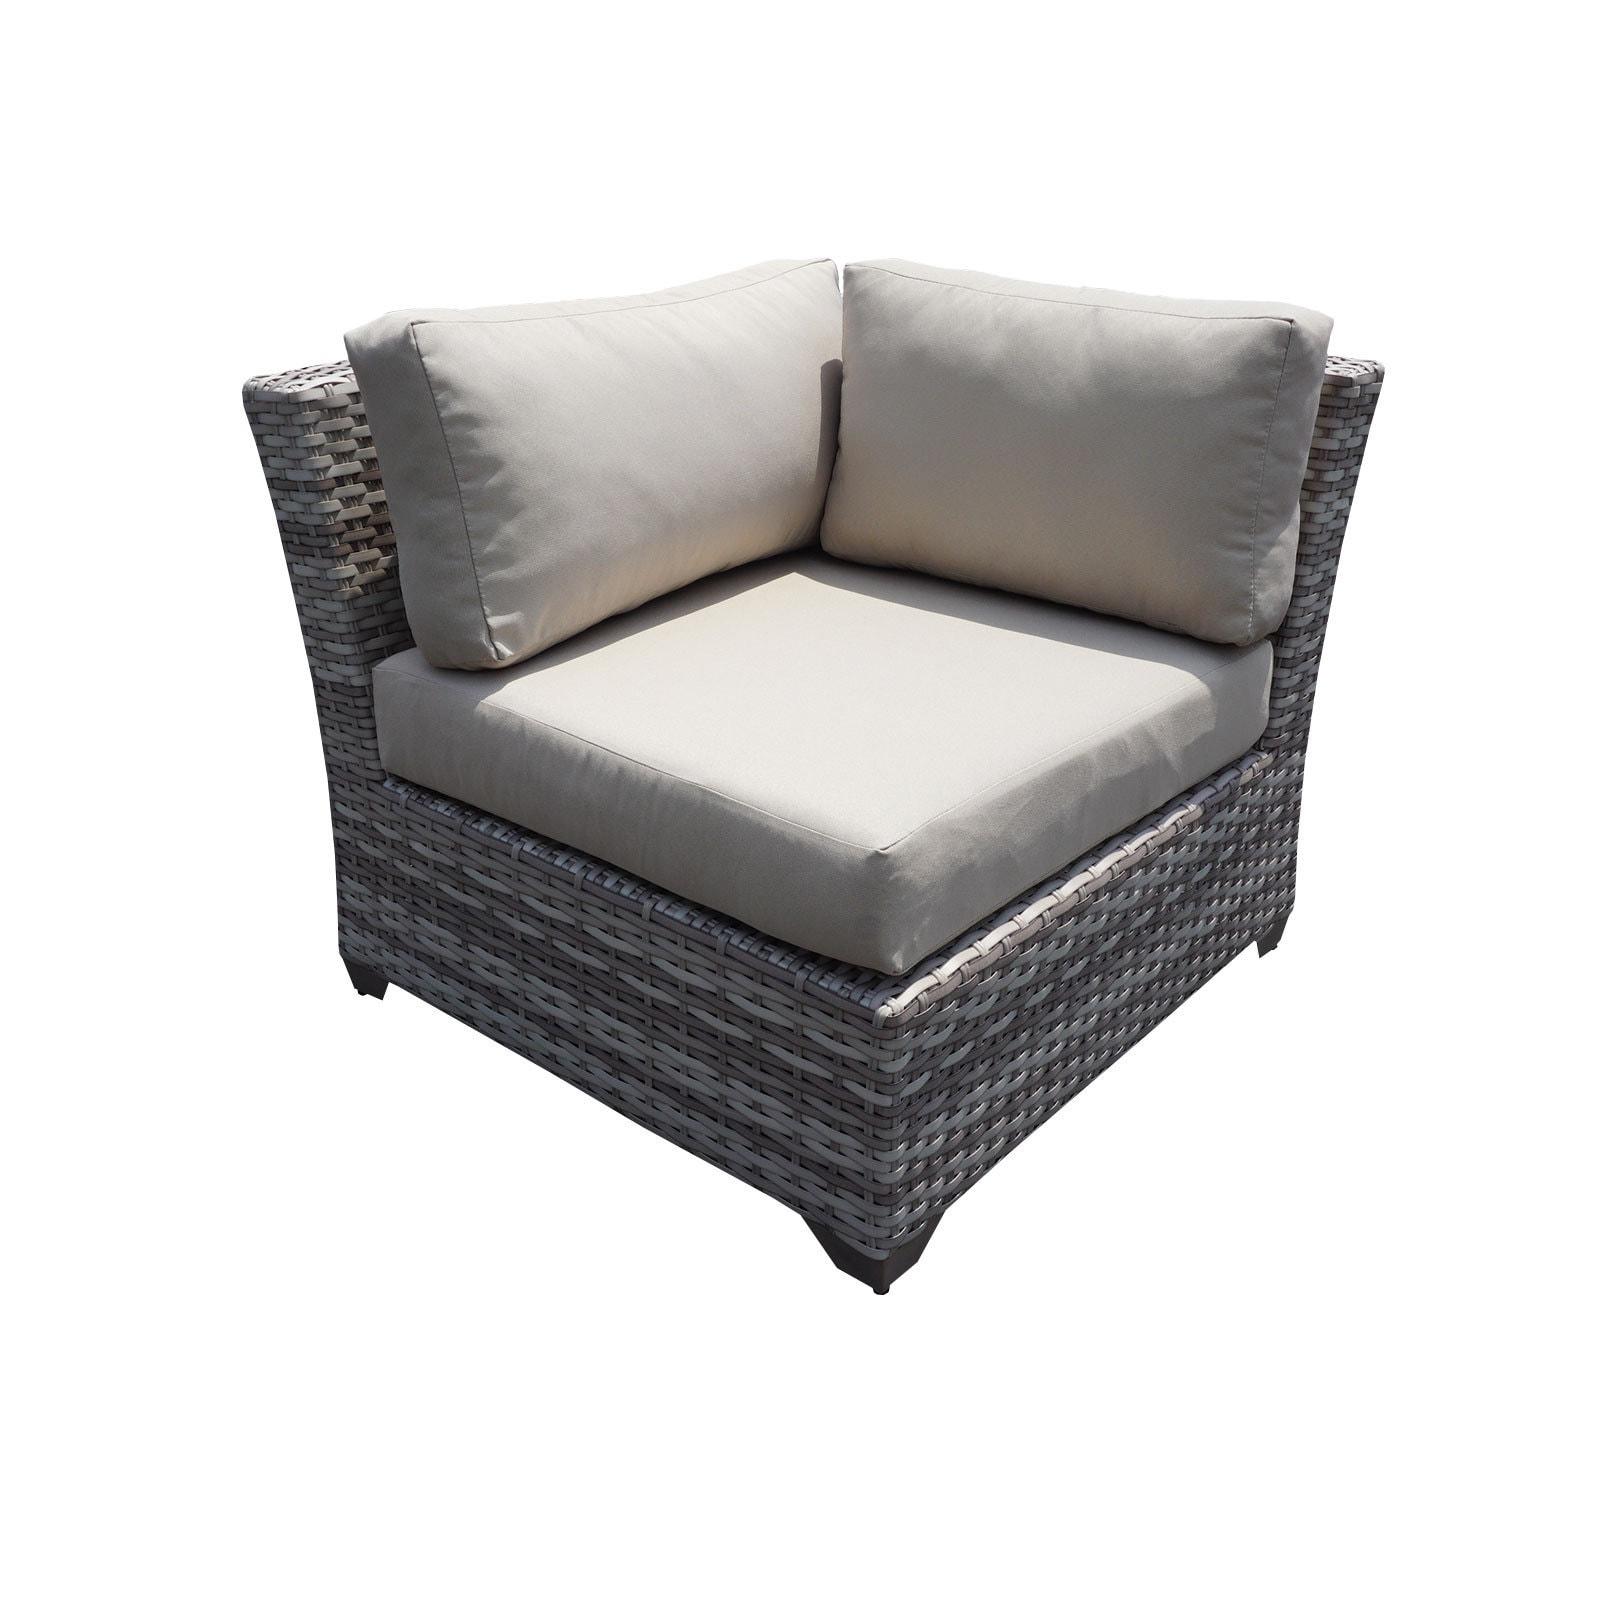 Fairmont 9 Piece Outdoor Wicker Patio Furniture Set 09c Free